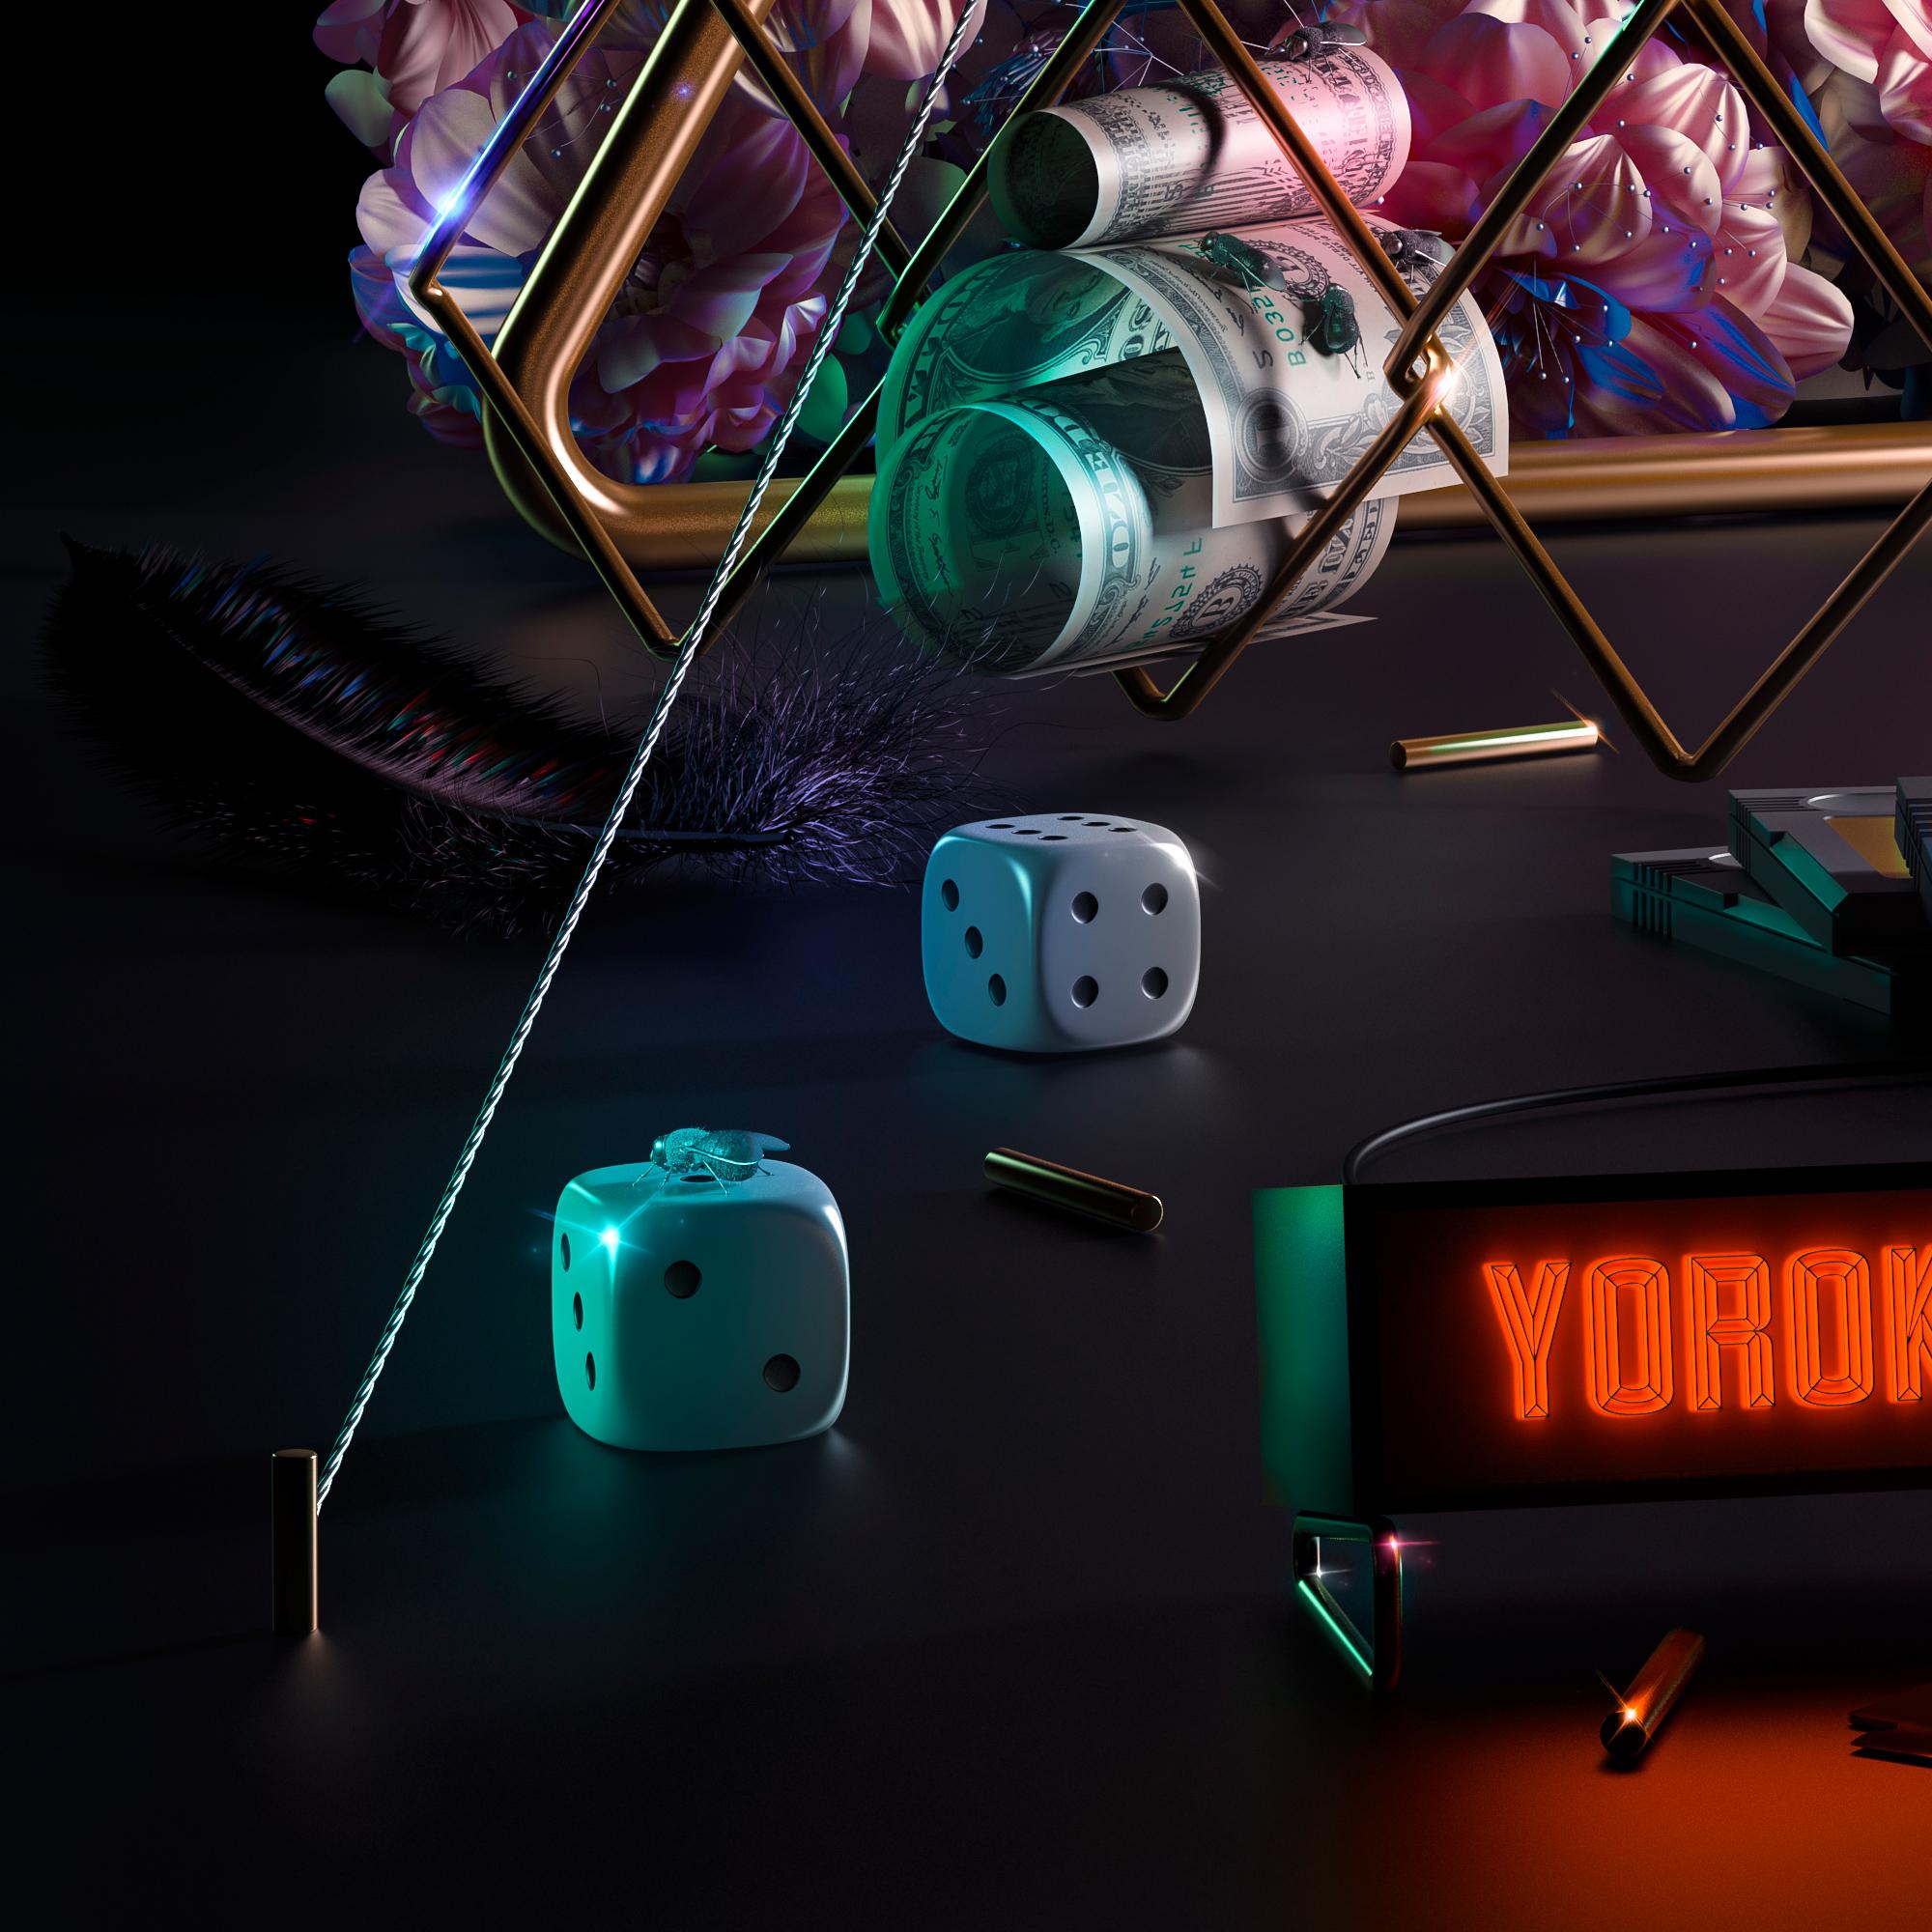 yorokobu-cover-4k-macro-2